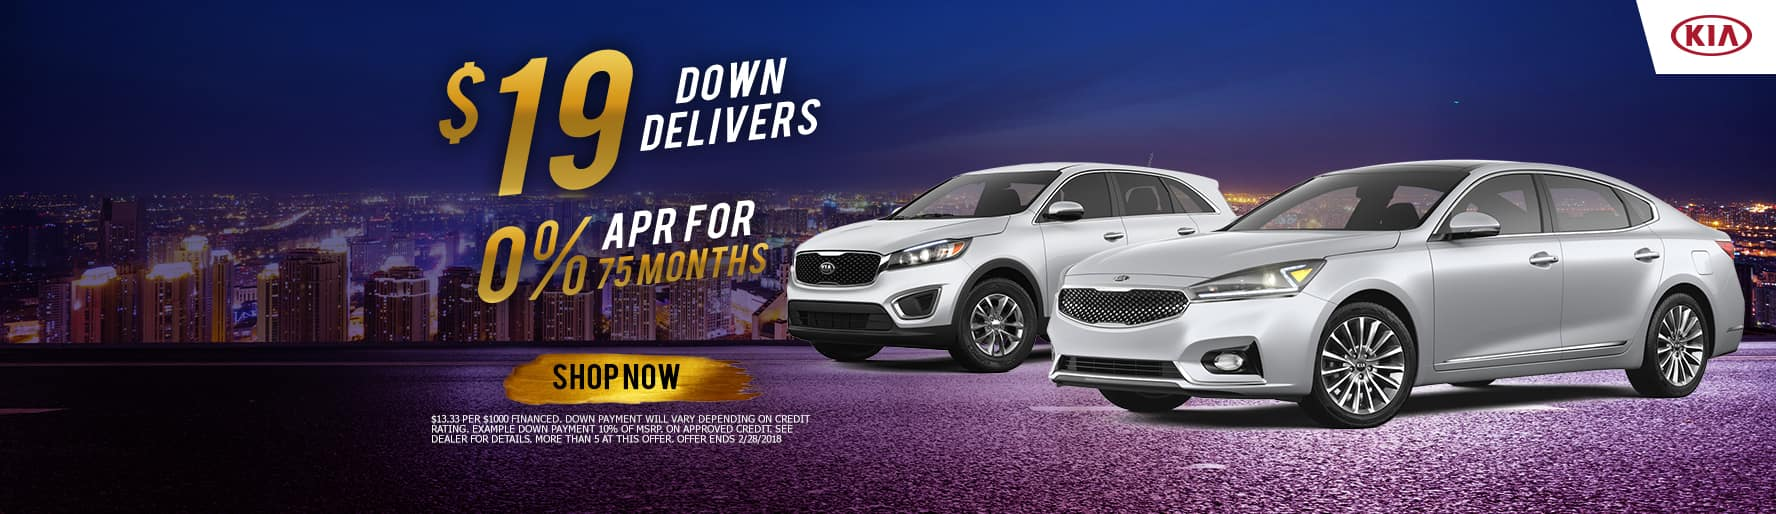 Kia Soul Dealer Near Me >> Gene Messer Kia | Lubbock New & Used Car Dealership Near Me